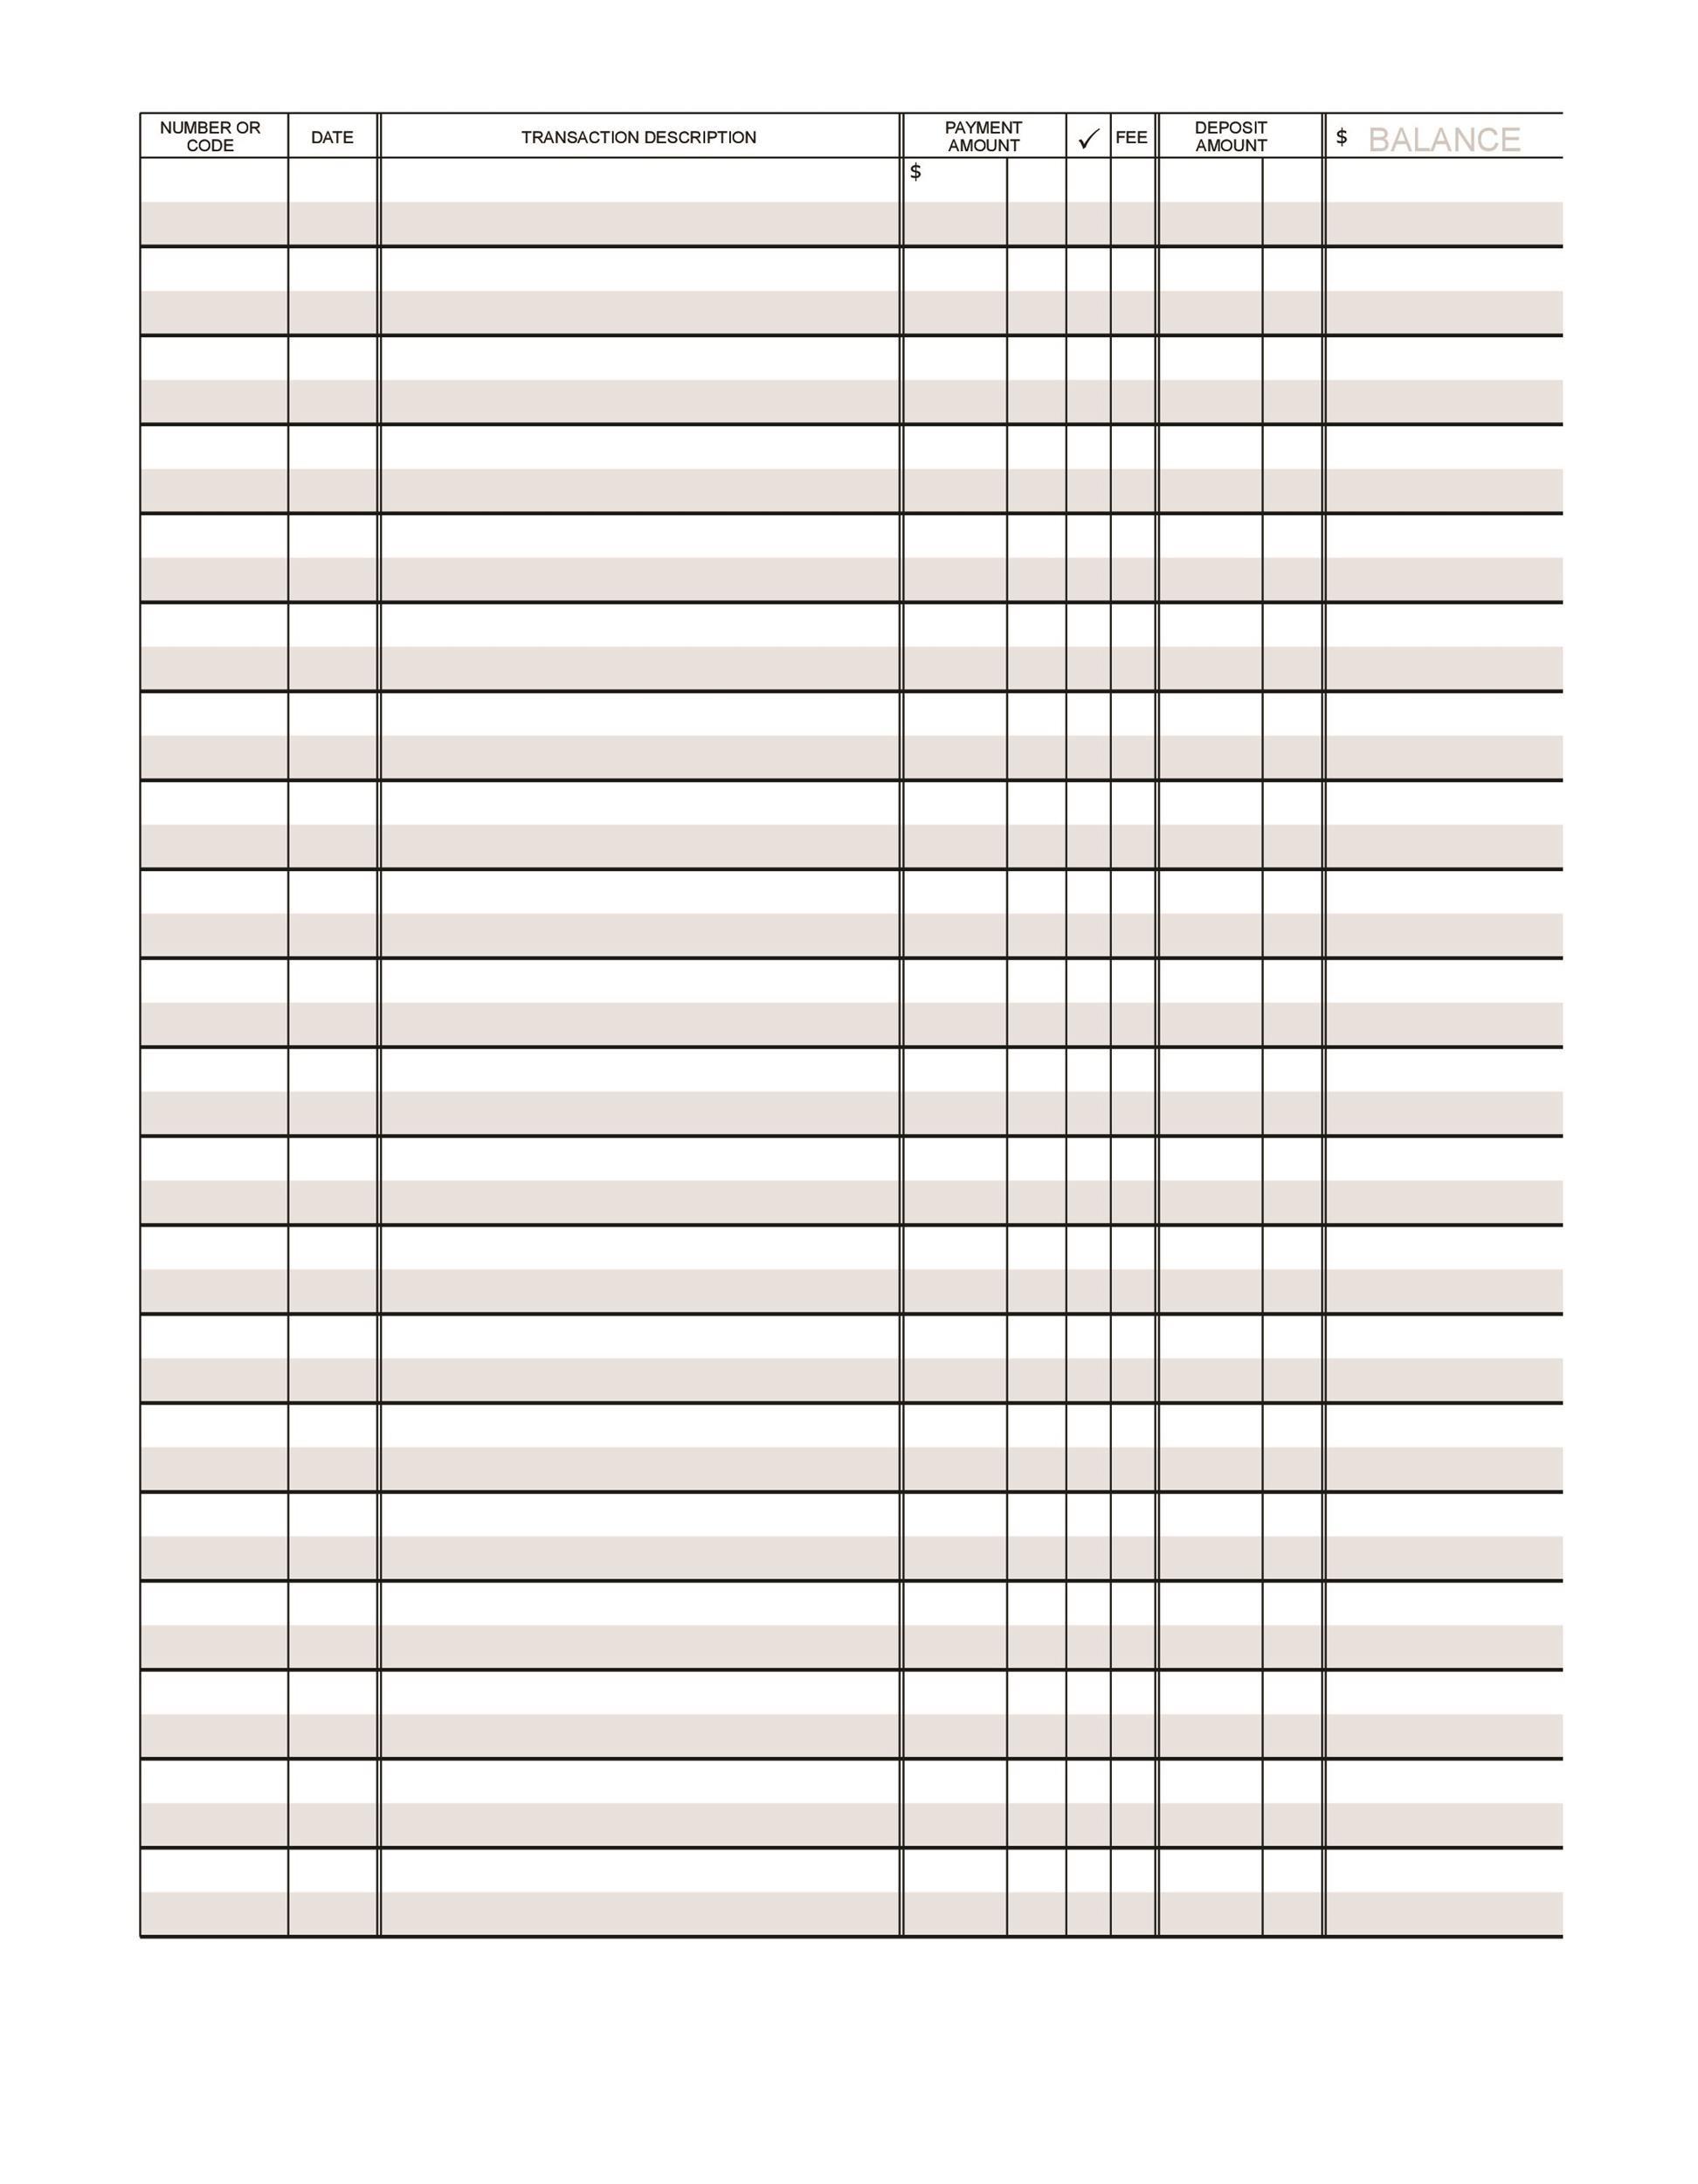 37 Checkbook Register Templates 100 Free, Printable ᐅ Template Lab